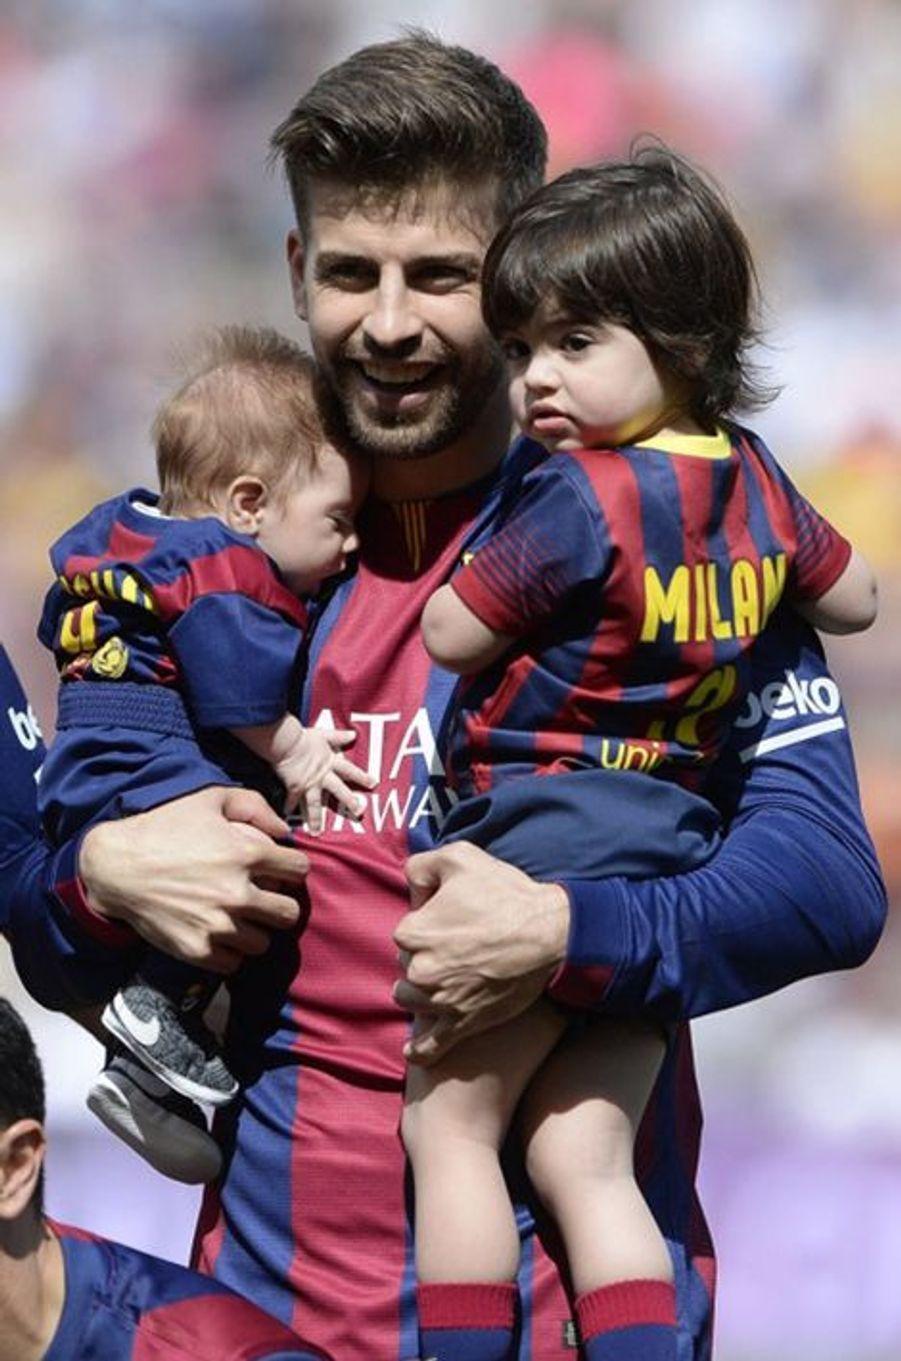 Gerard Piqué et ses fils, Milan et Sasha